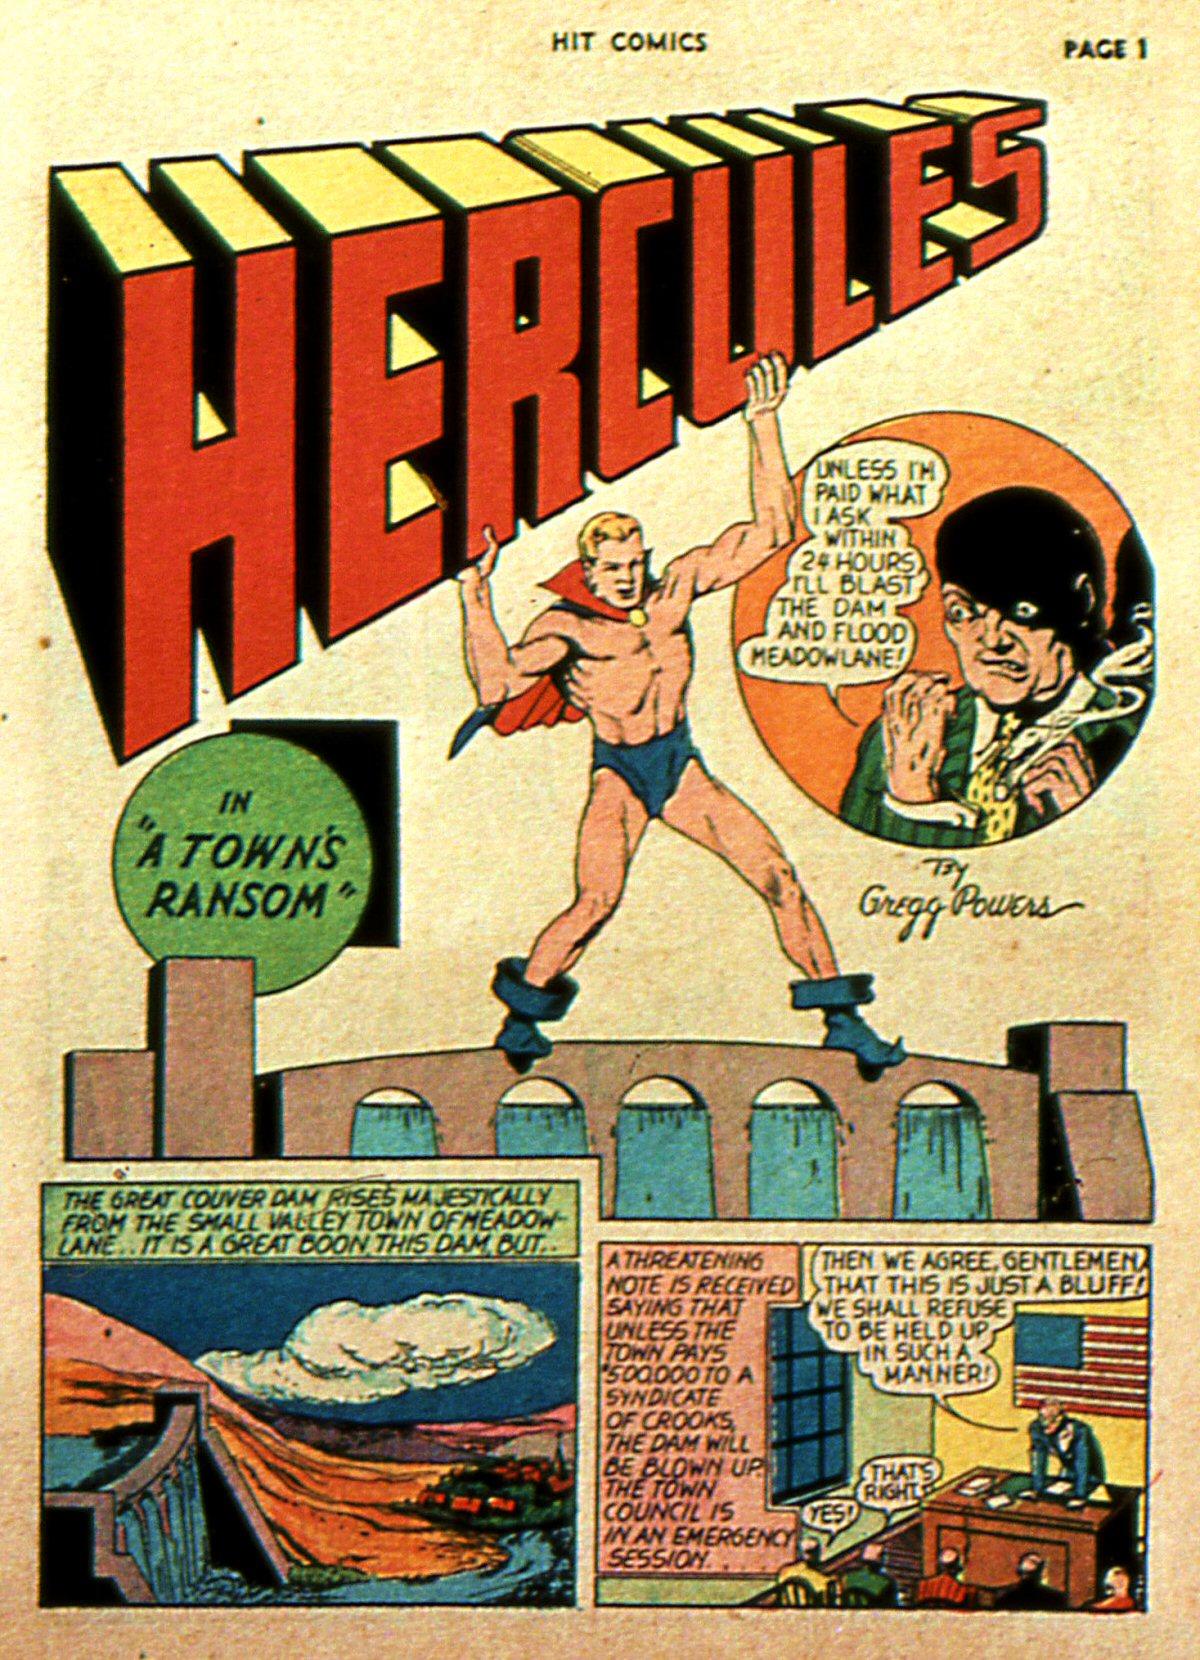 Read online Hit Comics comic -  Issue #2 - 3